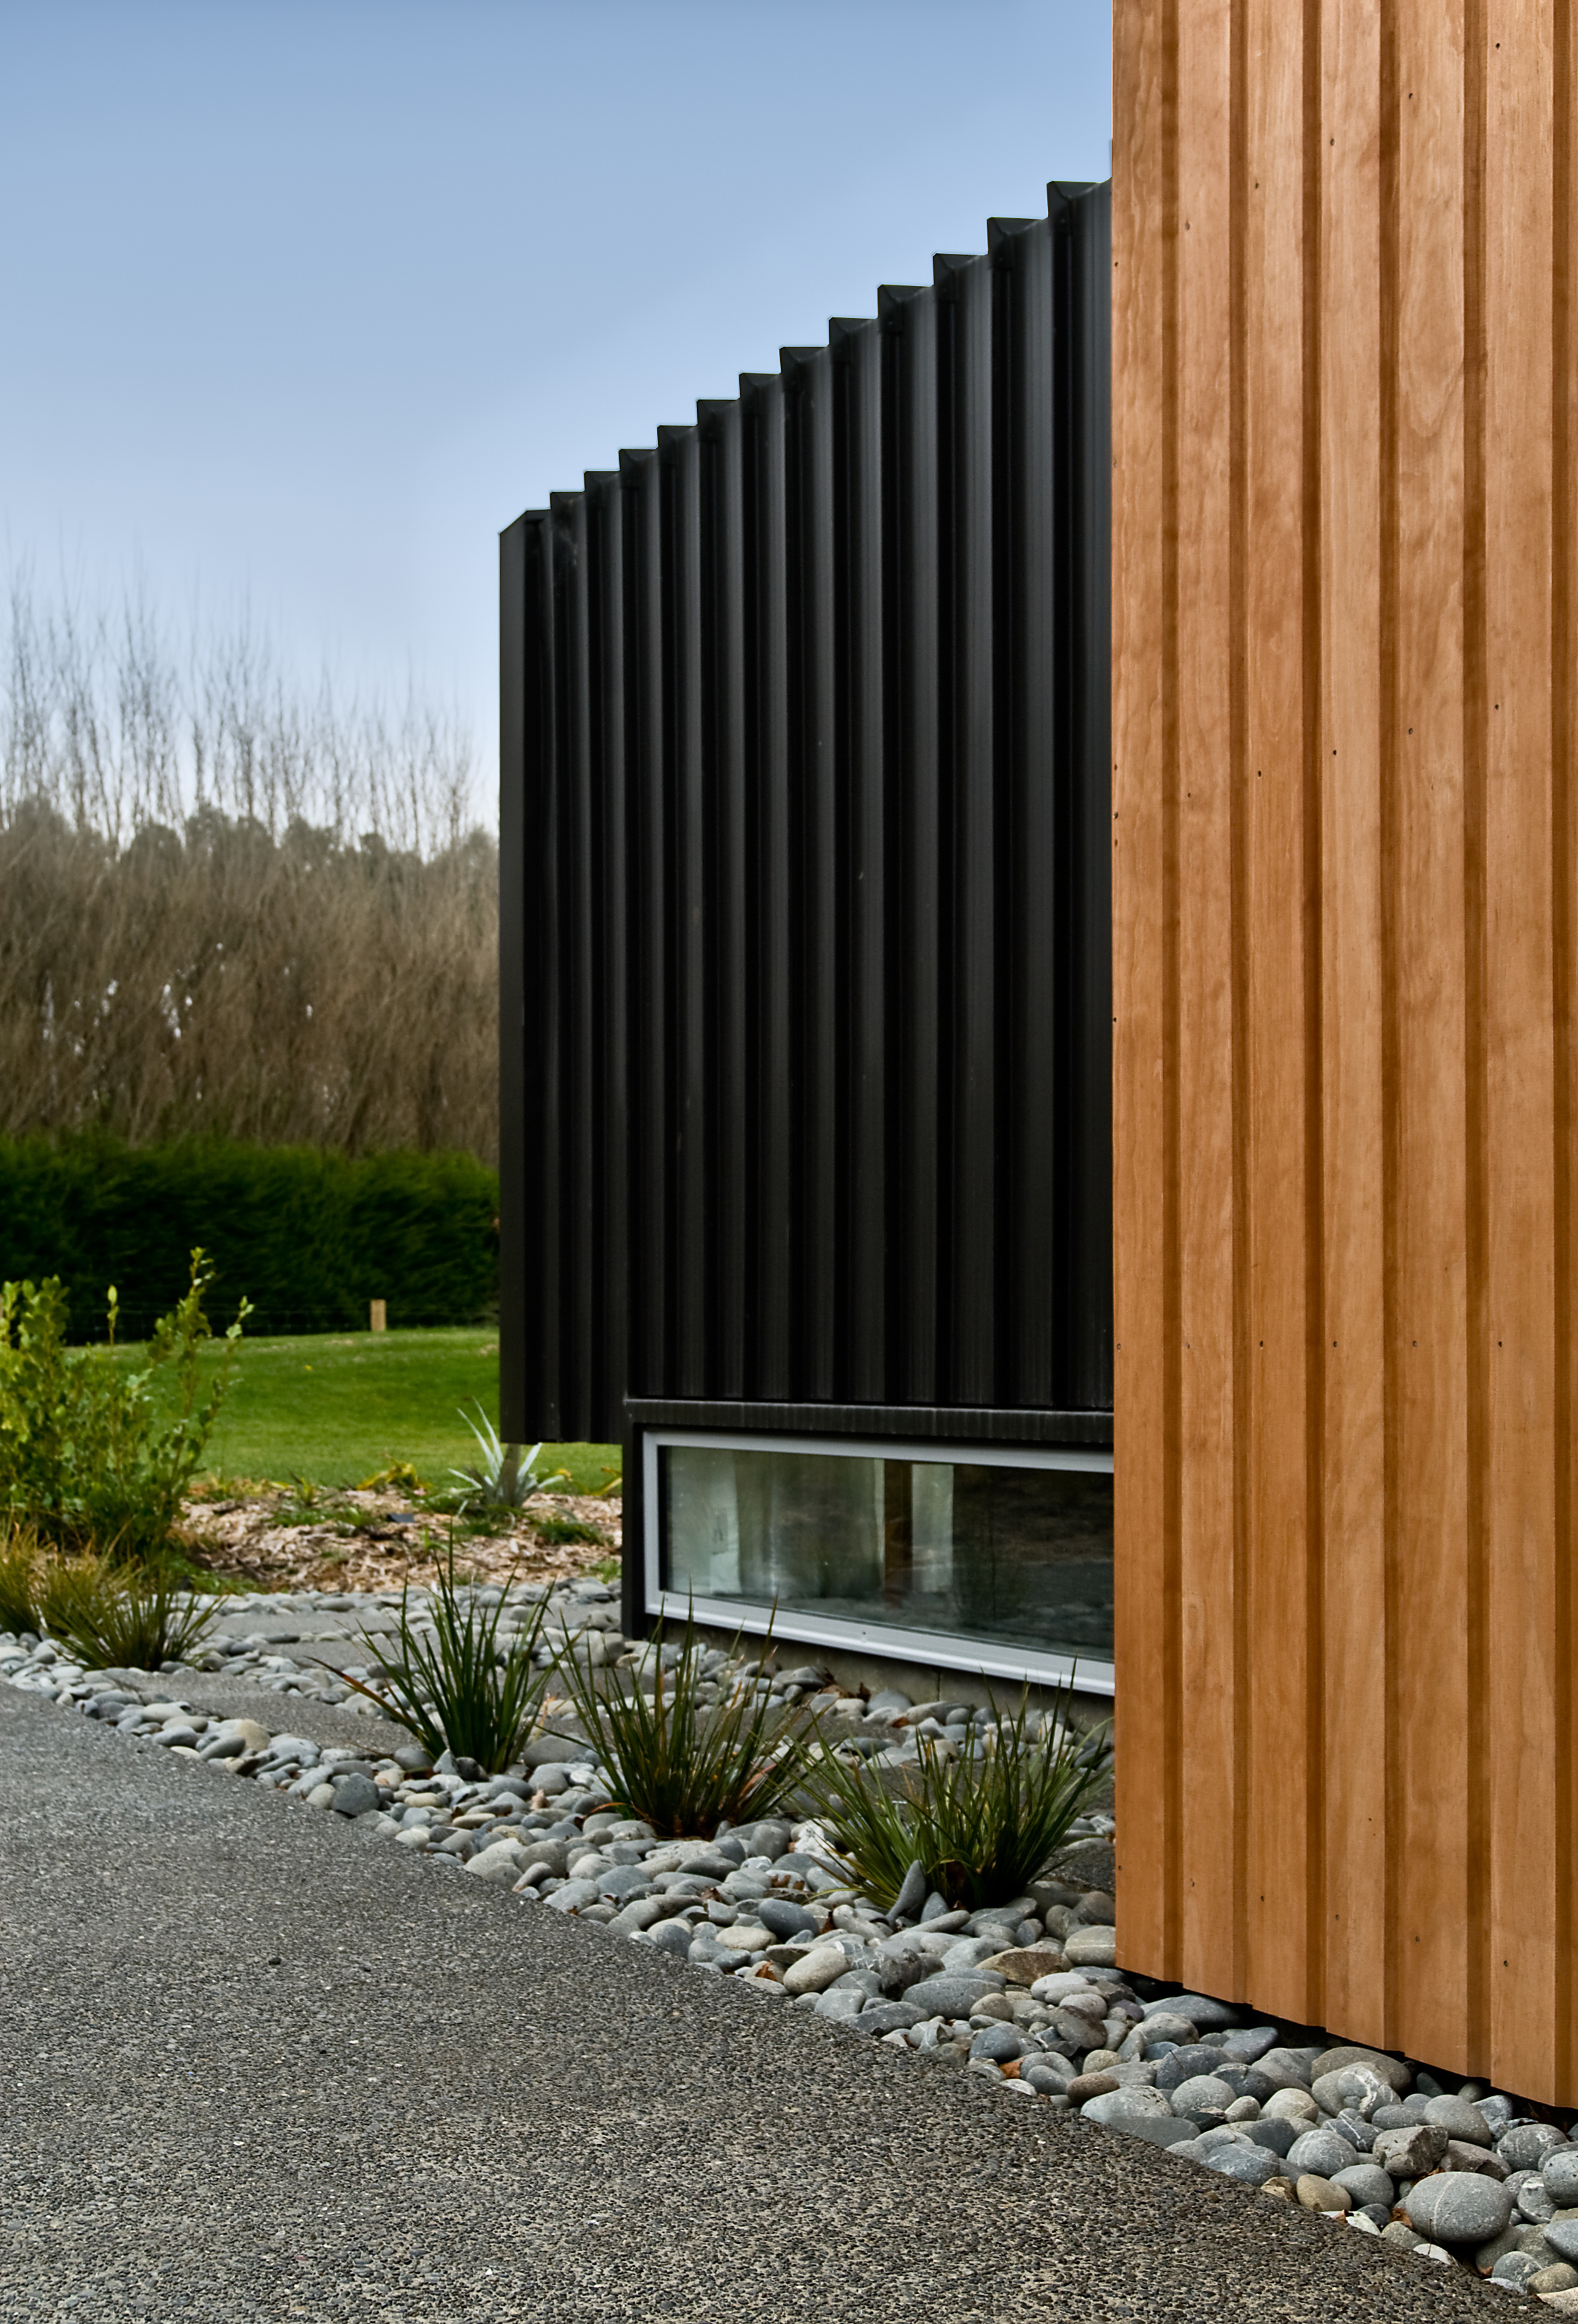 090614_Stufkens_Architecture_Lin_McCaughan_004_exterior_detail.jpg